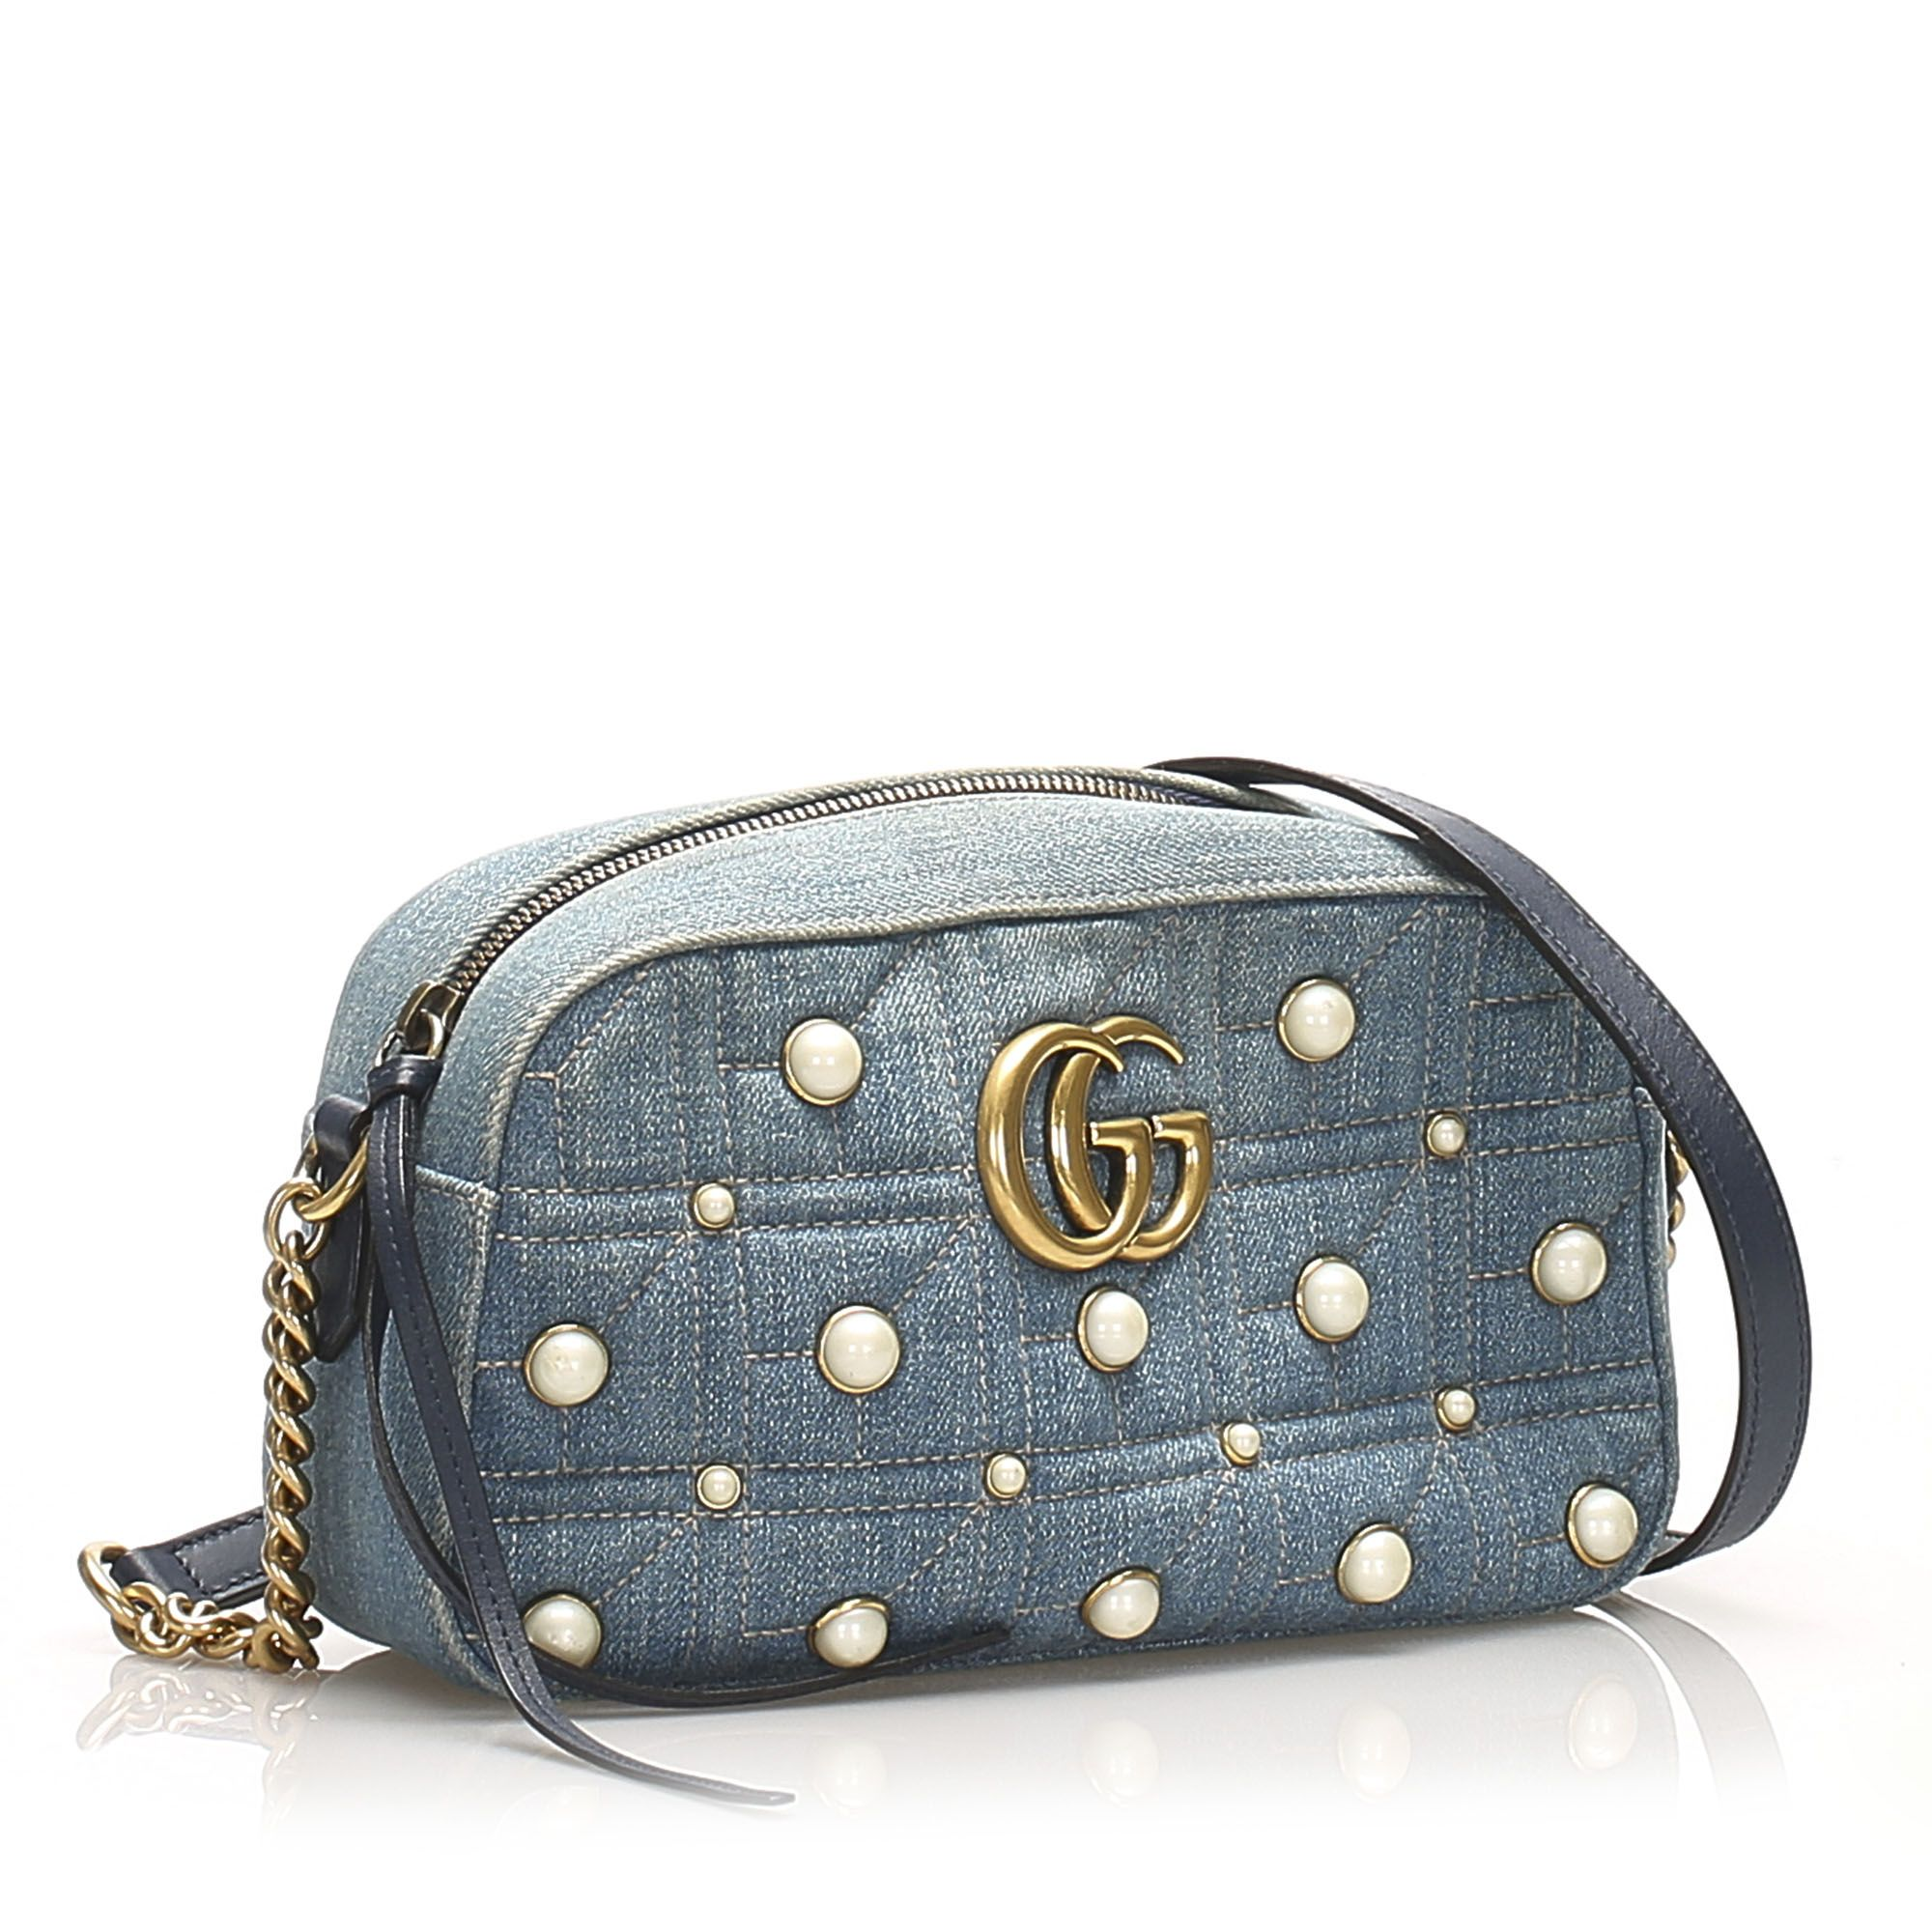 Vintage Gucci Studded GG Marmont Denim Crossbody Blue